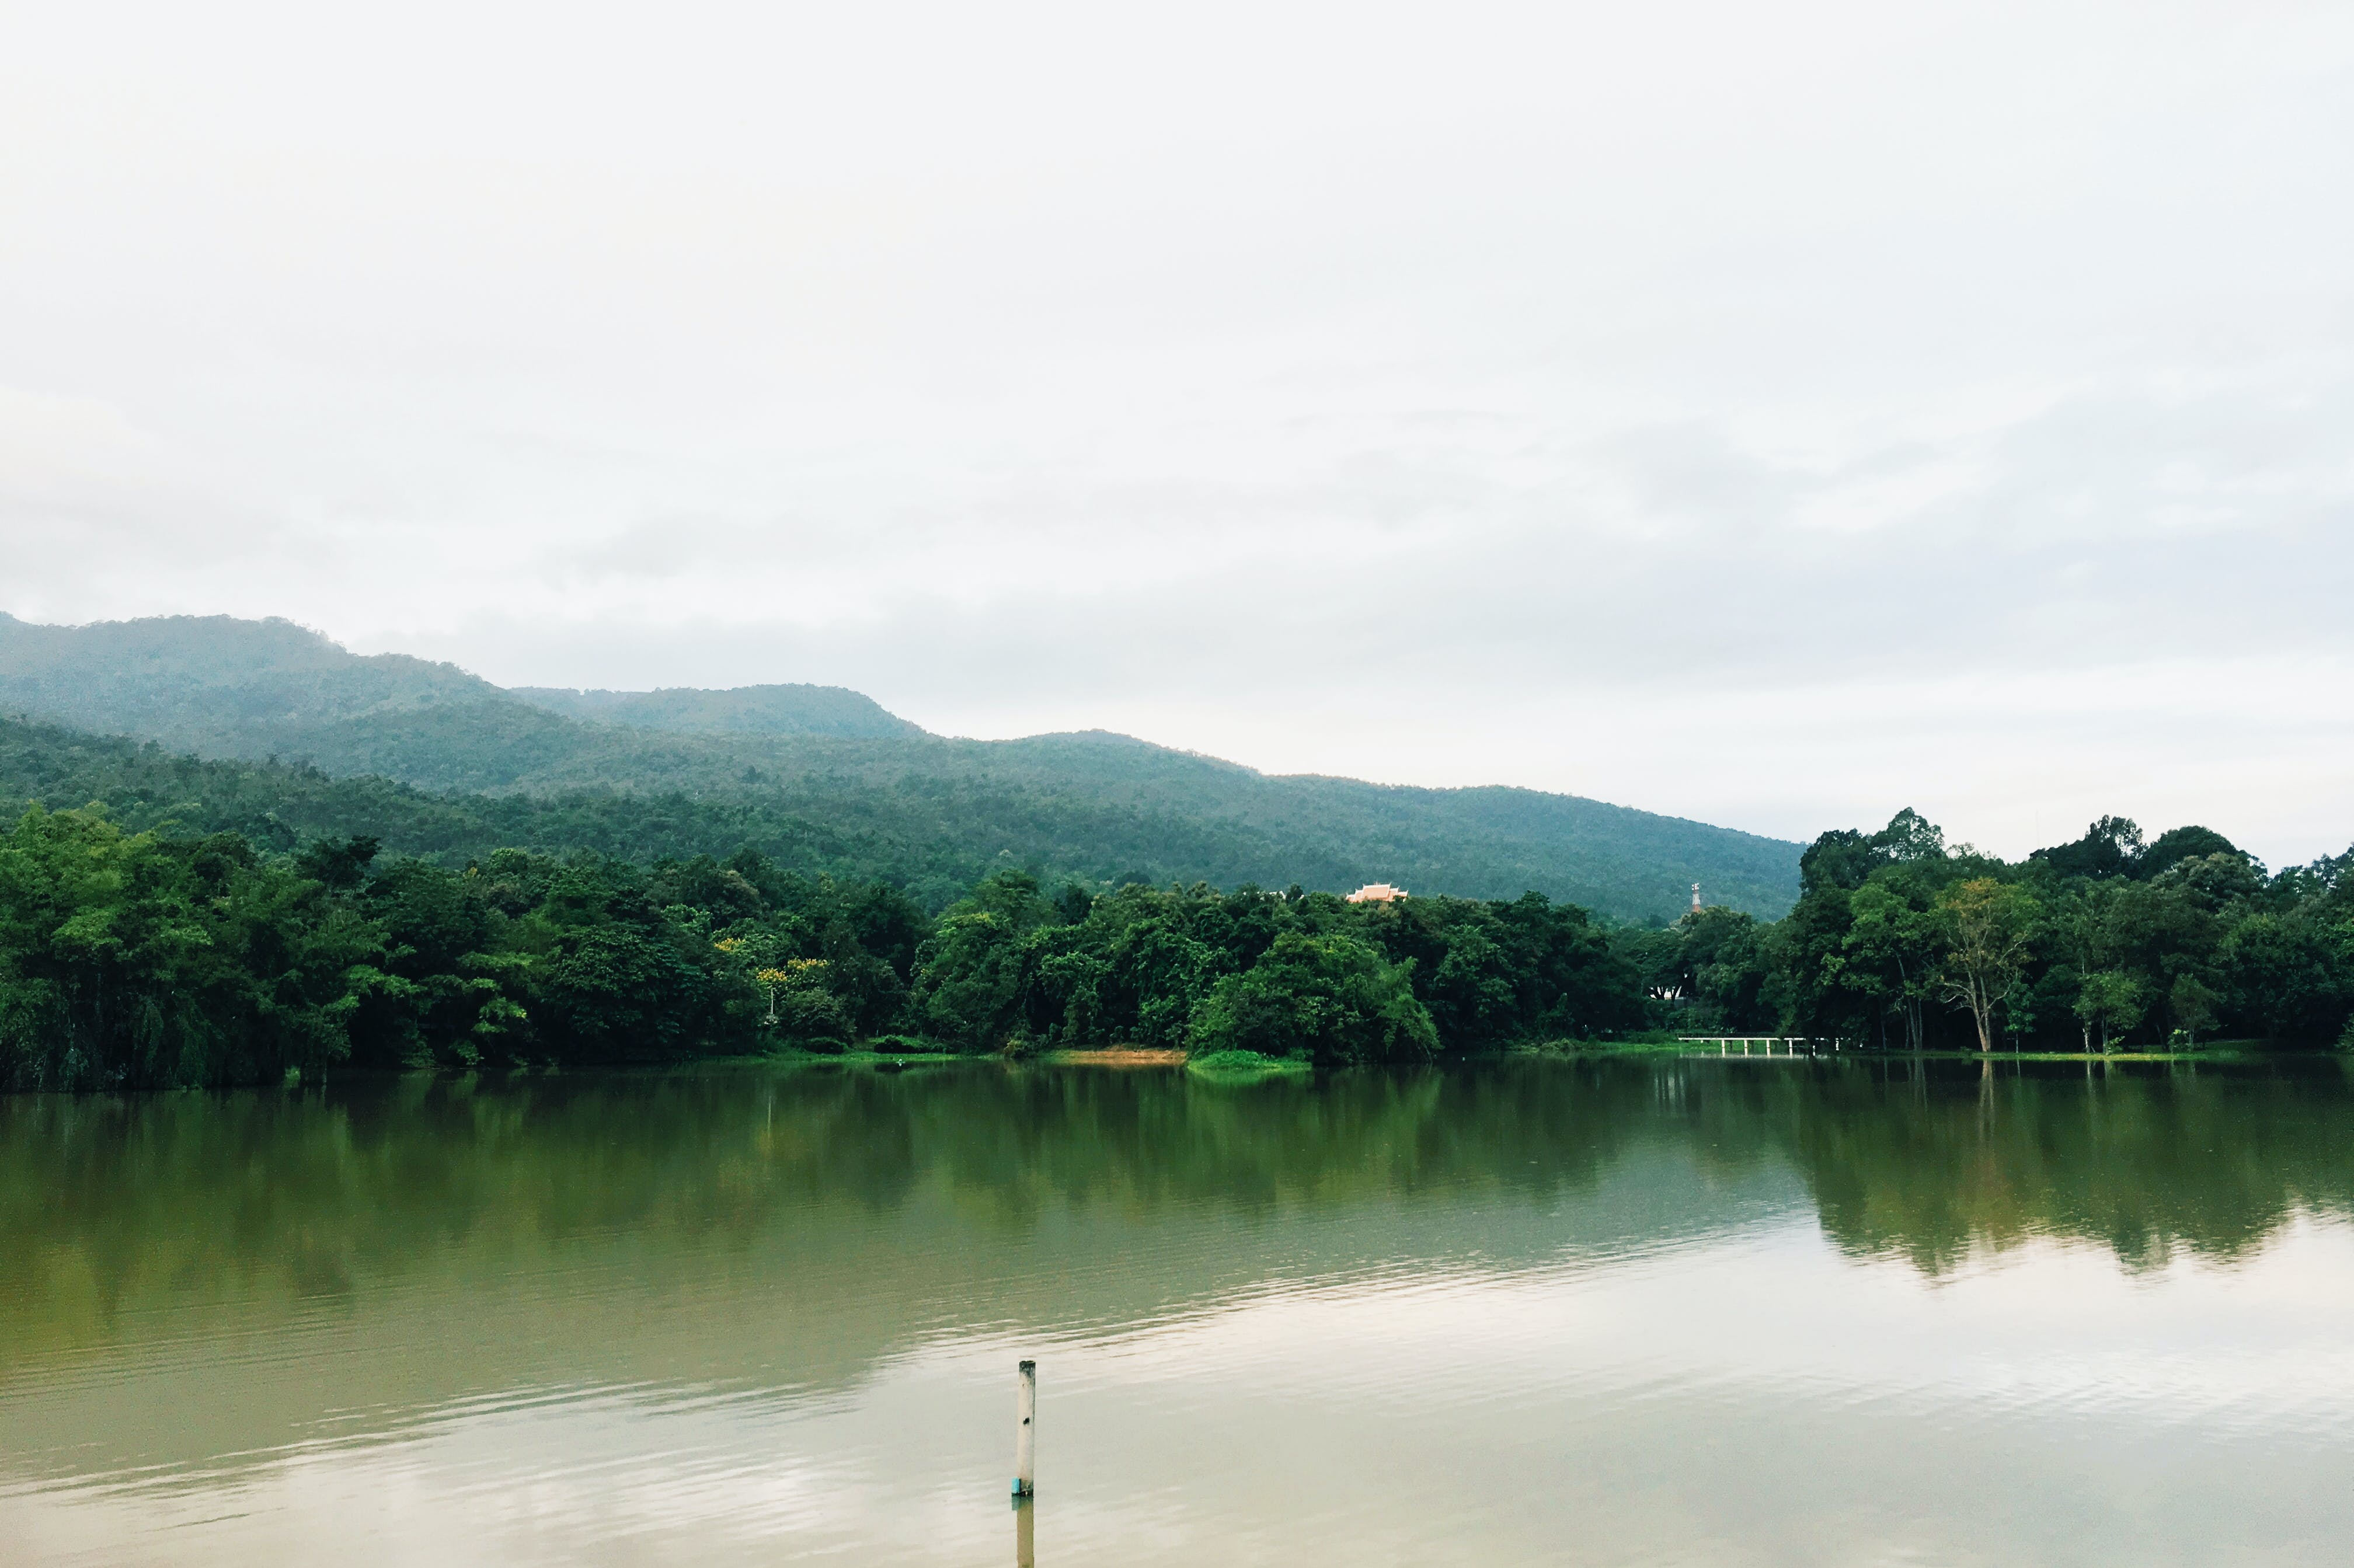 Lake Near Trees Under Cloudy Sky